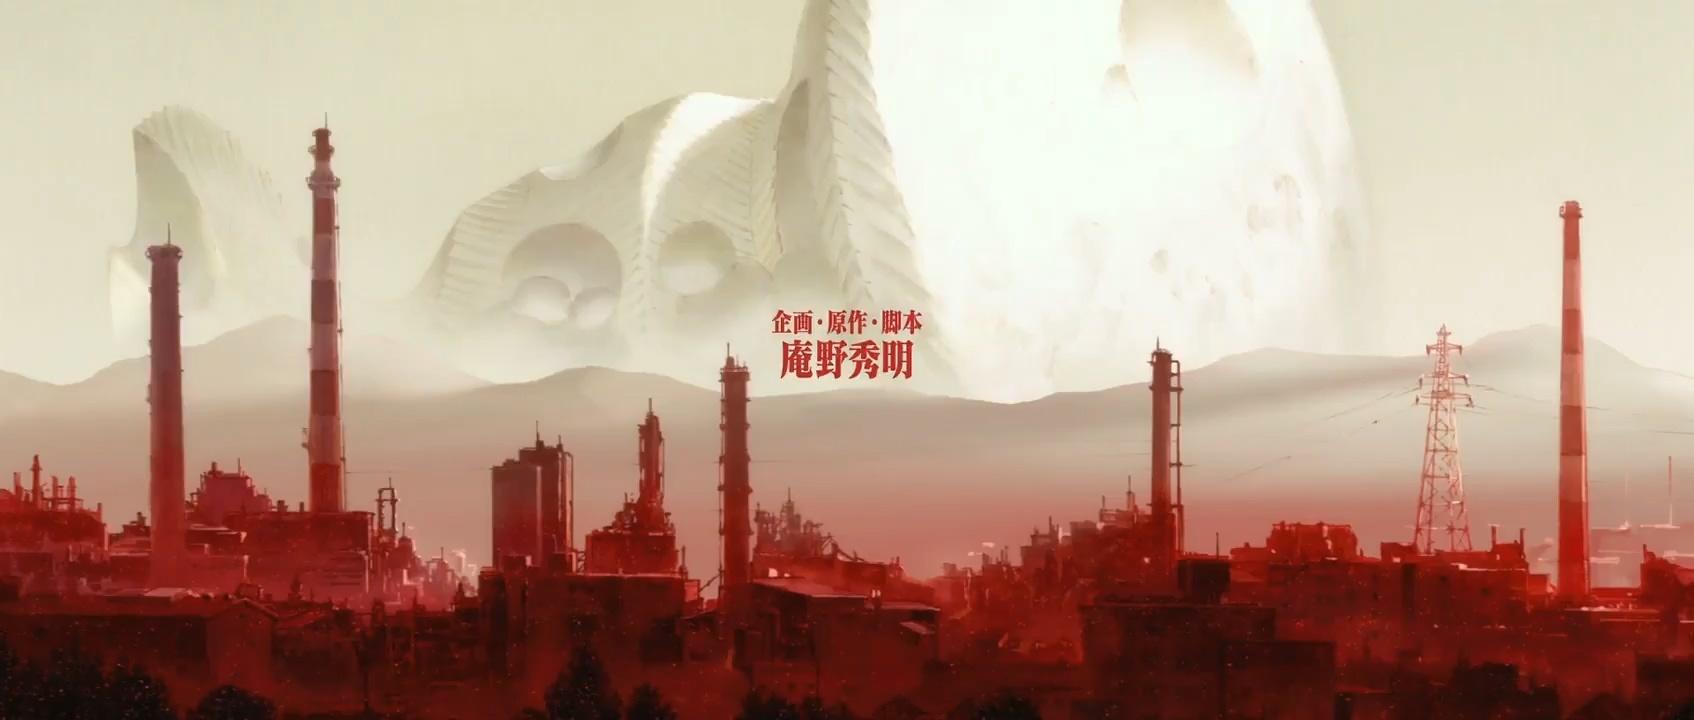 Amazon Prime《新世紀福音戰士新劇場版:終》2分鍾預告公布